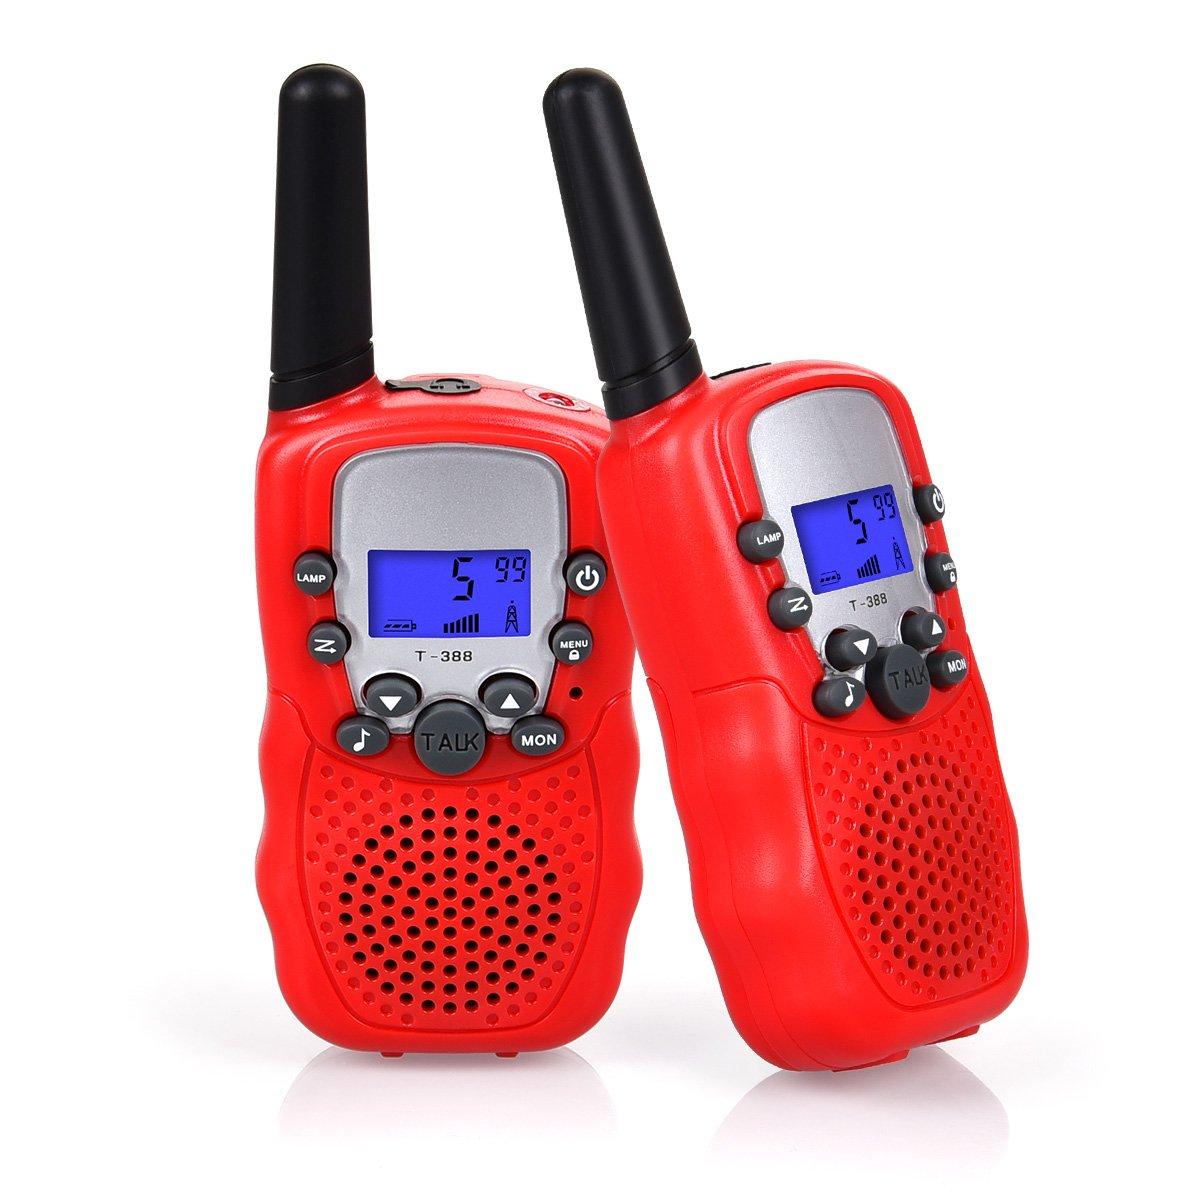 Swiftion Kids Walkie Talkies Long Range Two Way Radios 22 Channel Walky Talky FRS Walkie Talkies for Kids (Red)